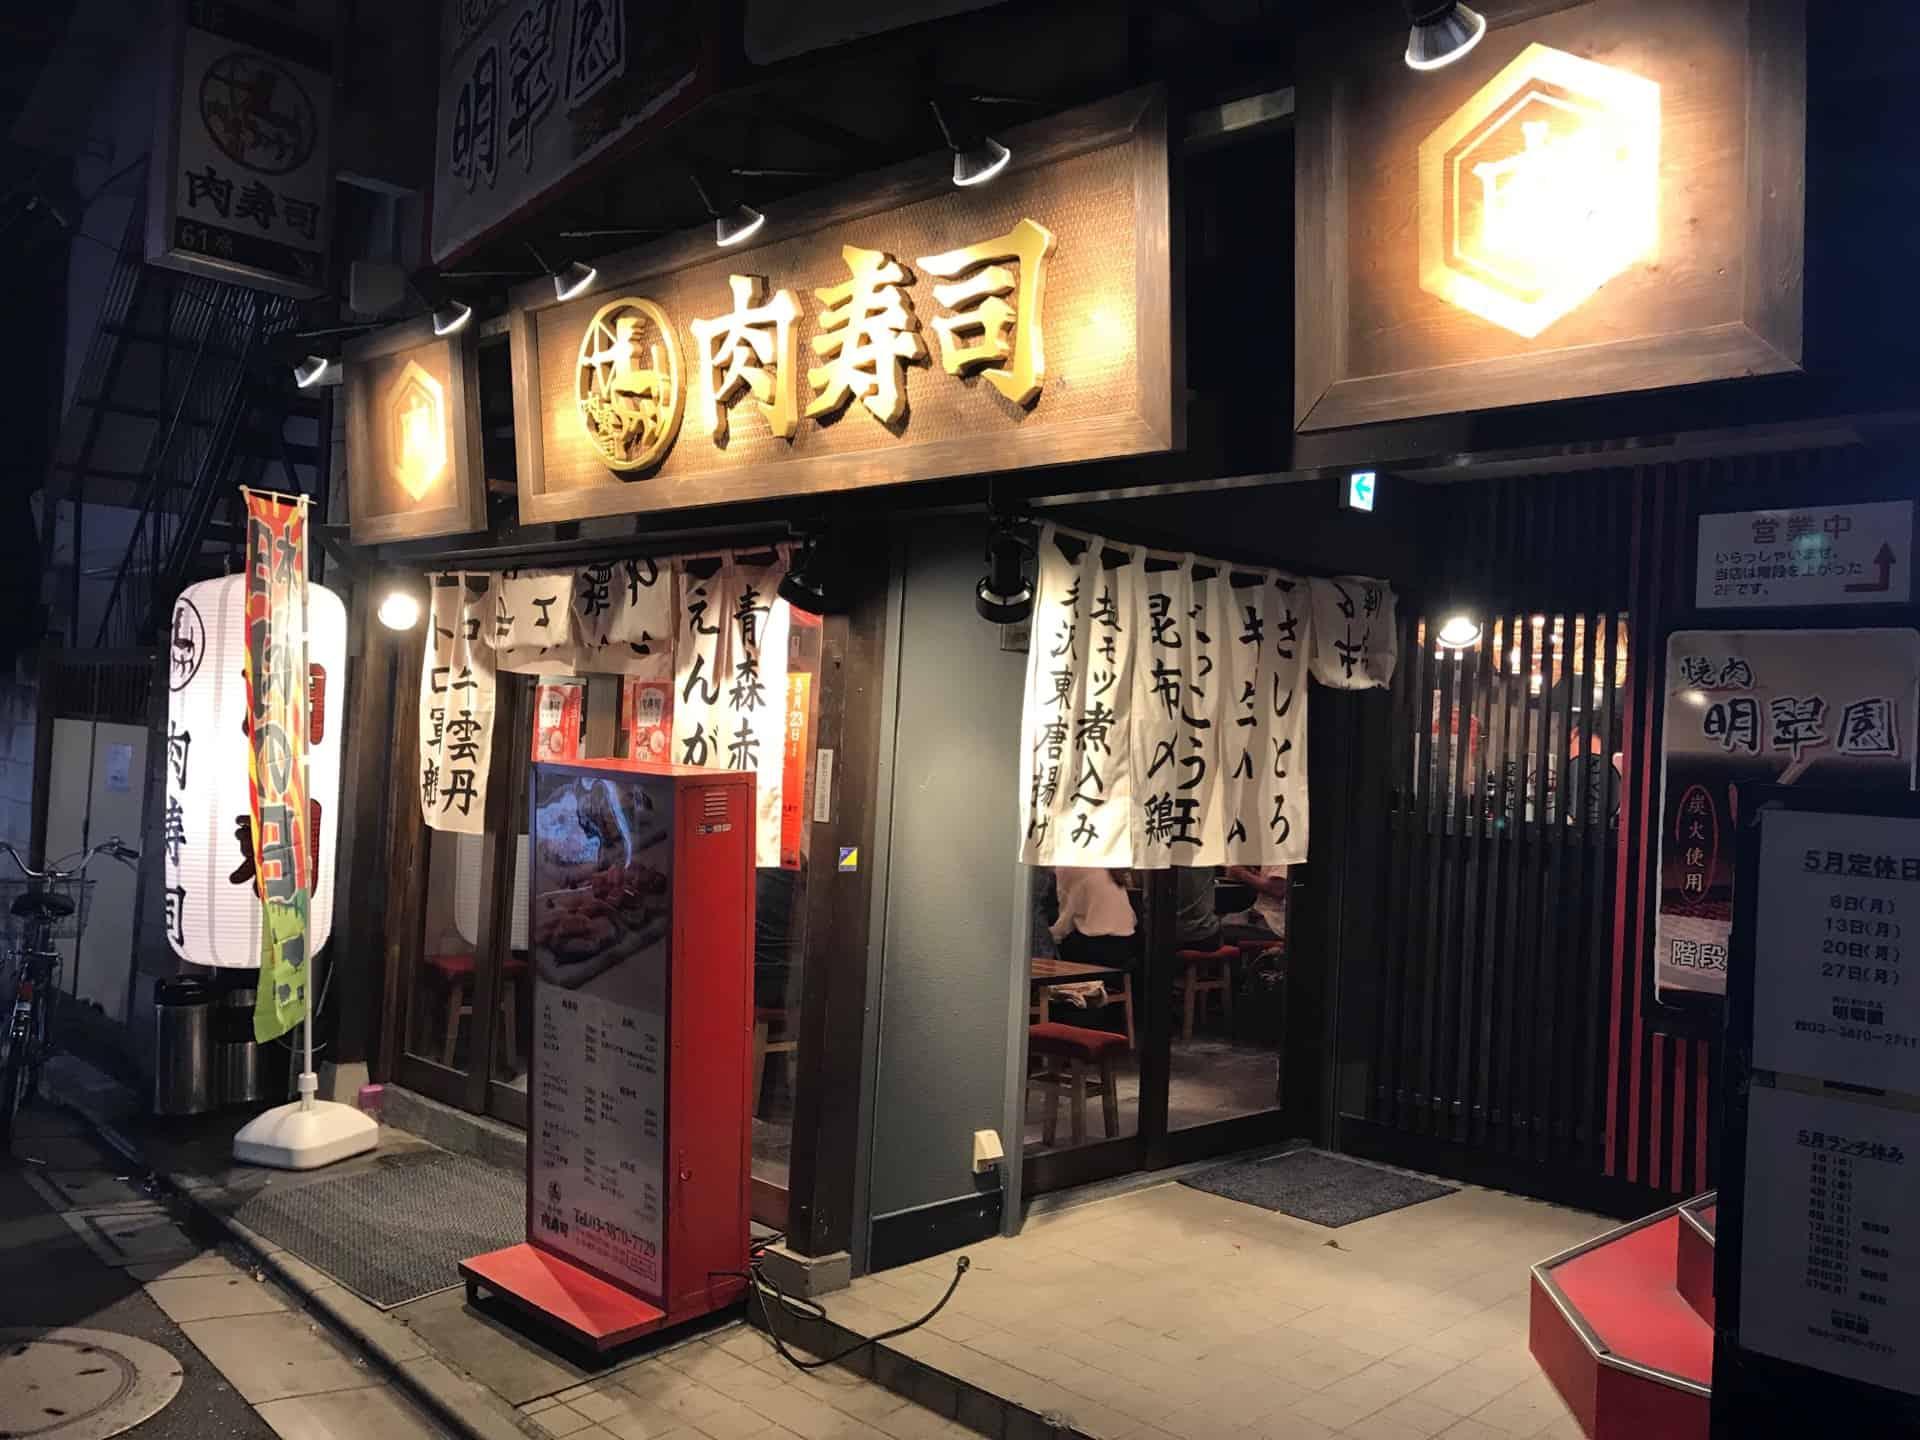 Kitasenju Nikuzushi ร้านซูชิชื่อดังที่มี ซูชิเนื้อม้าดิบ จำหน่าย!